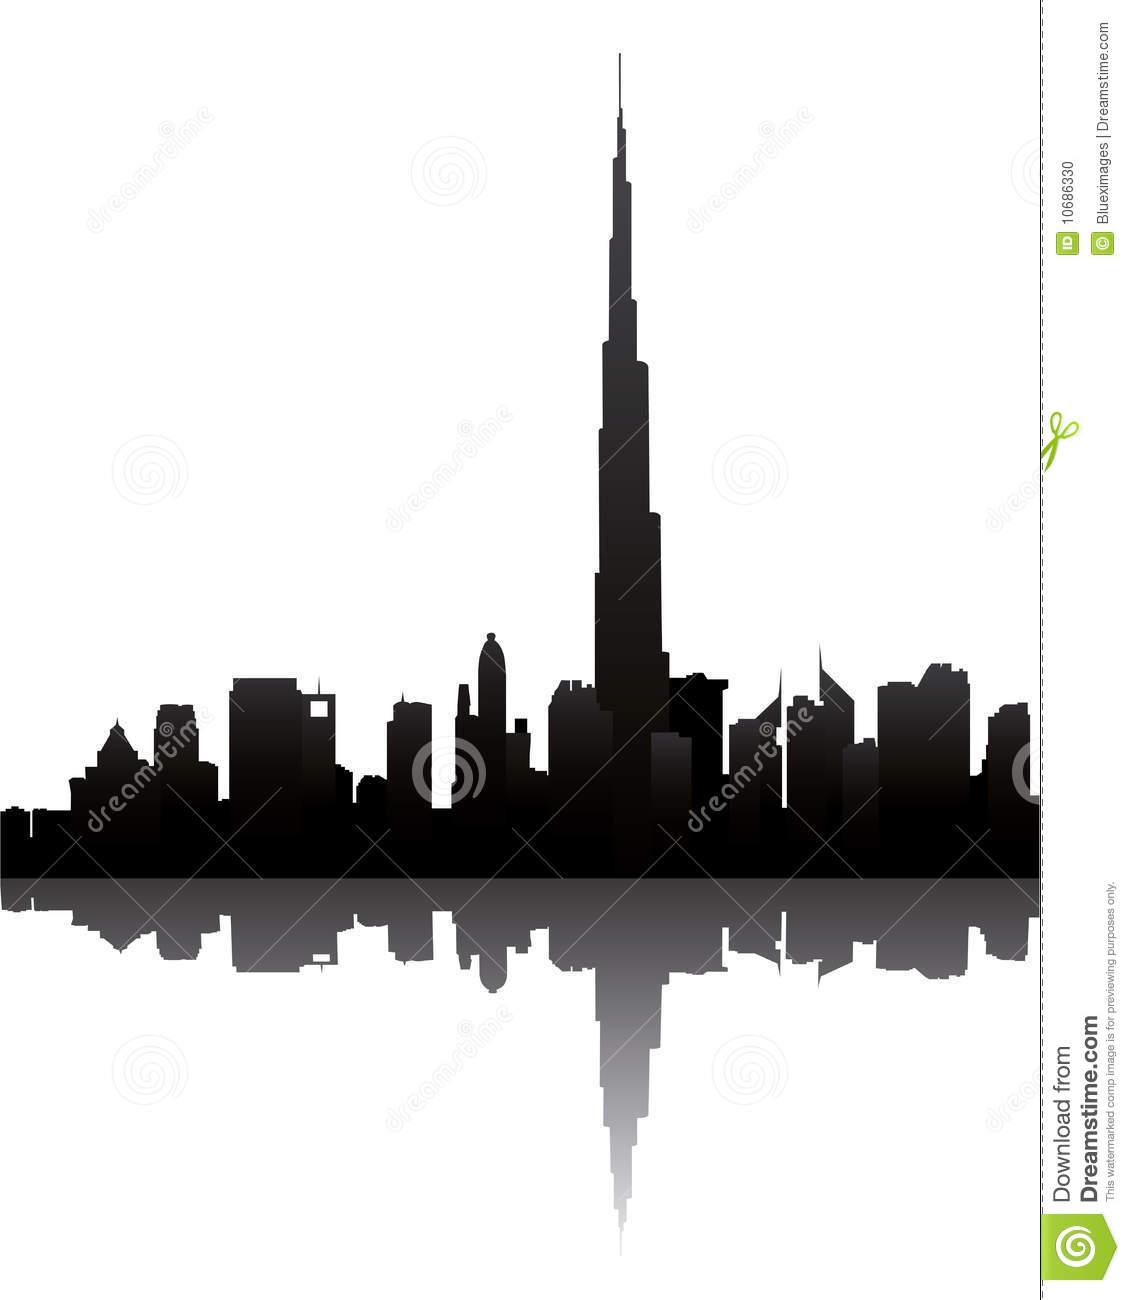 Dubai Skyline With Burj Dubai Stock Photo.